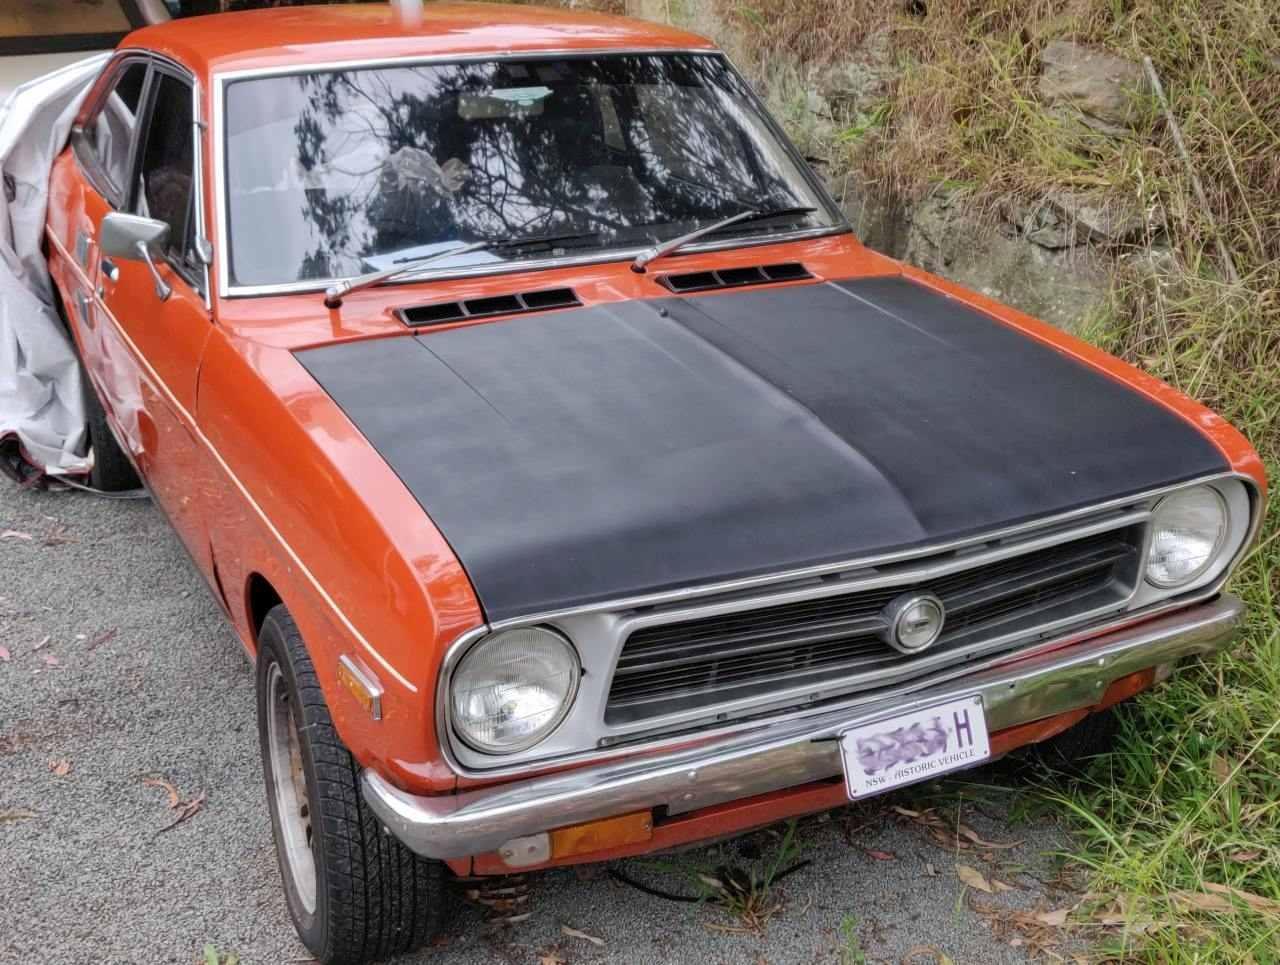 Datsun 1200 Coupe '73 various modifications